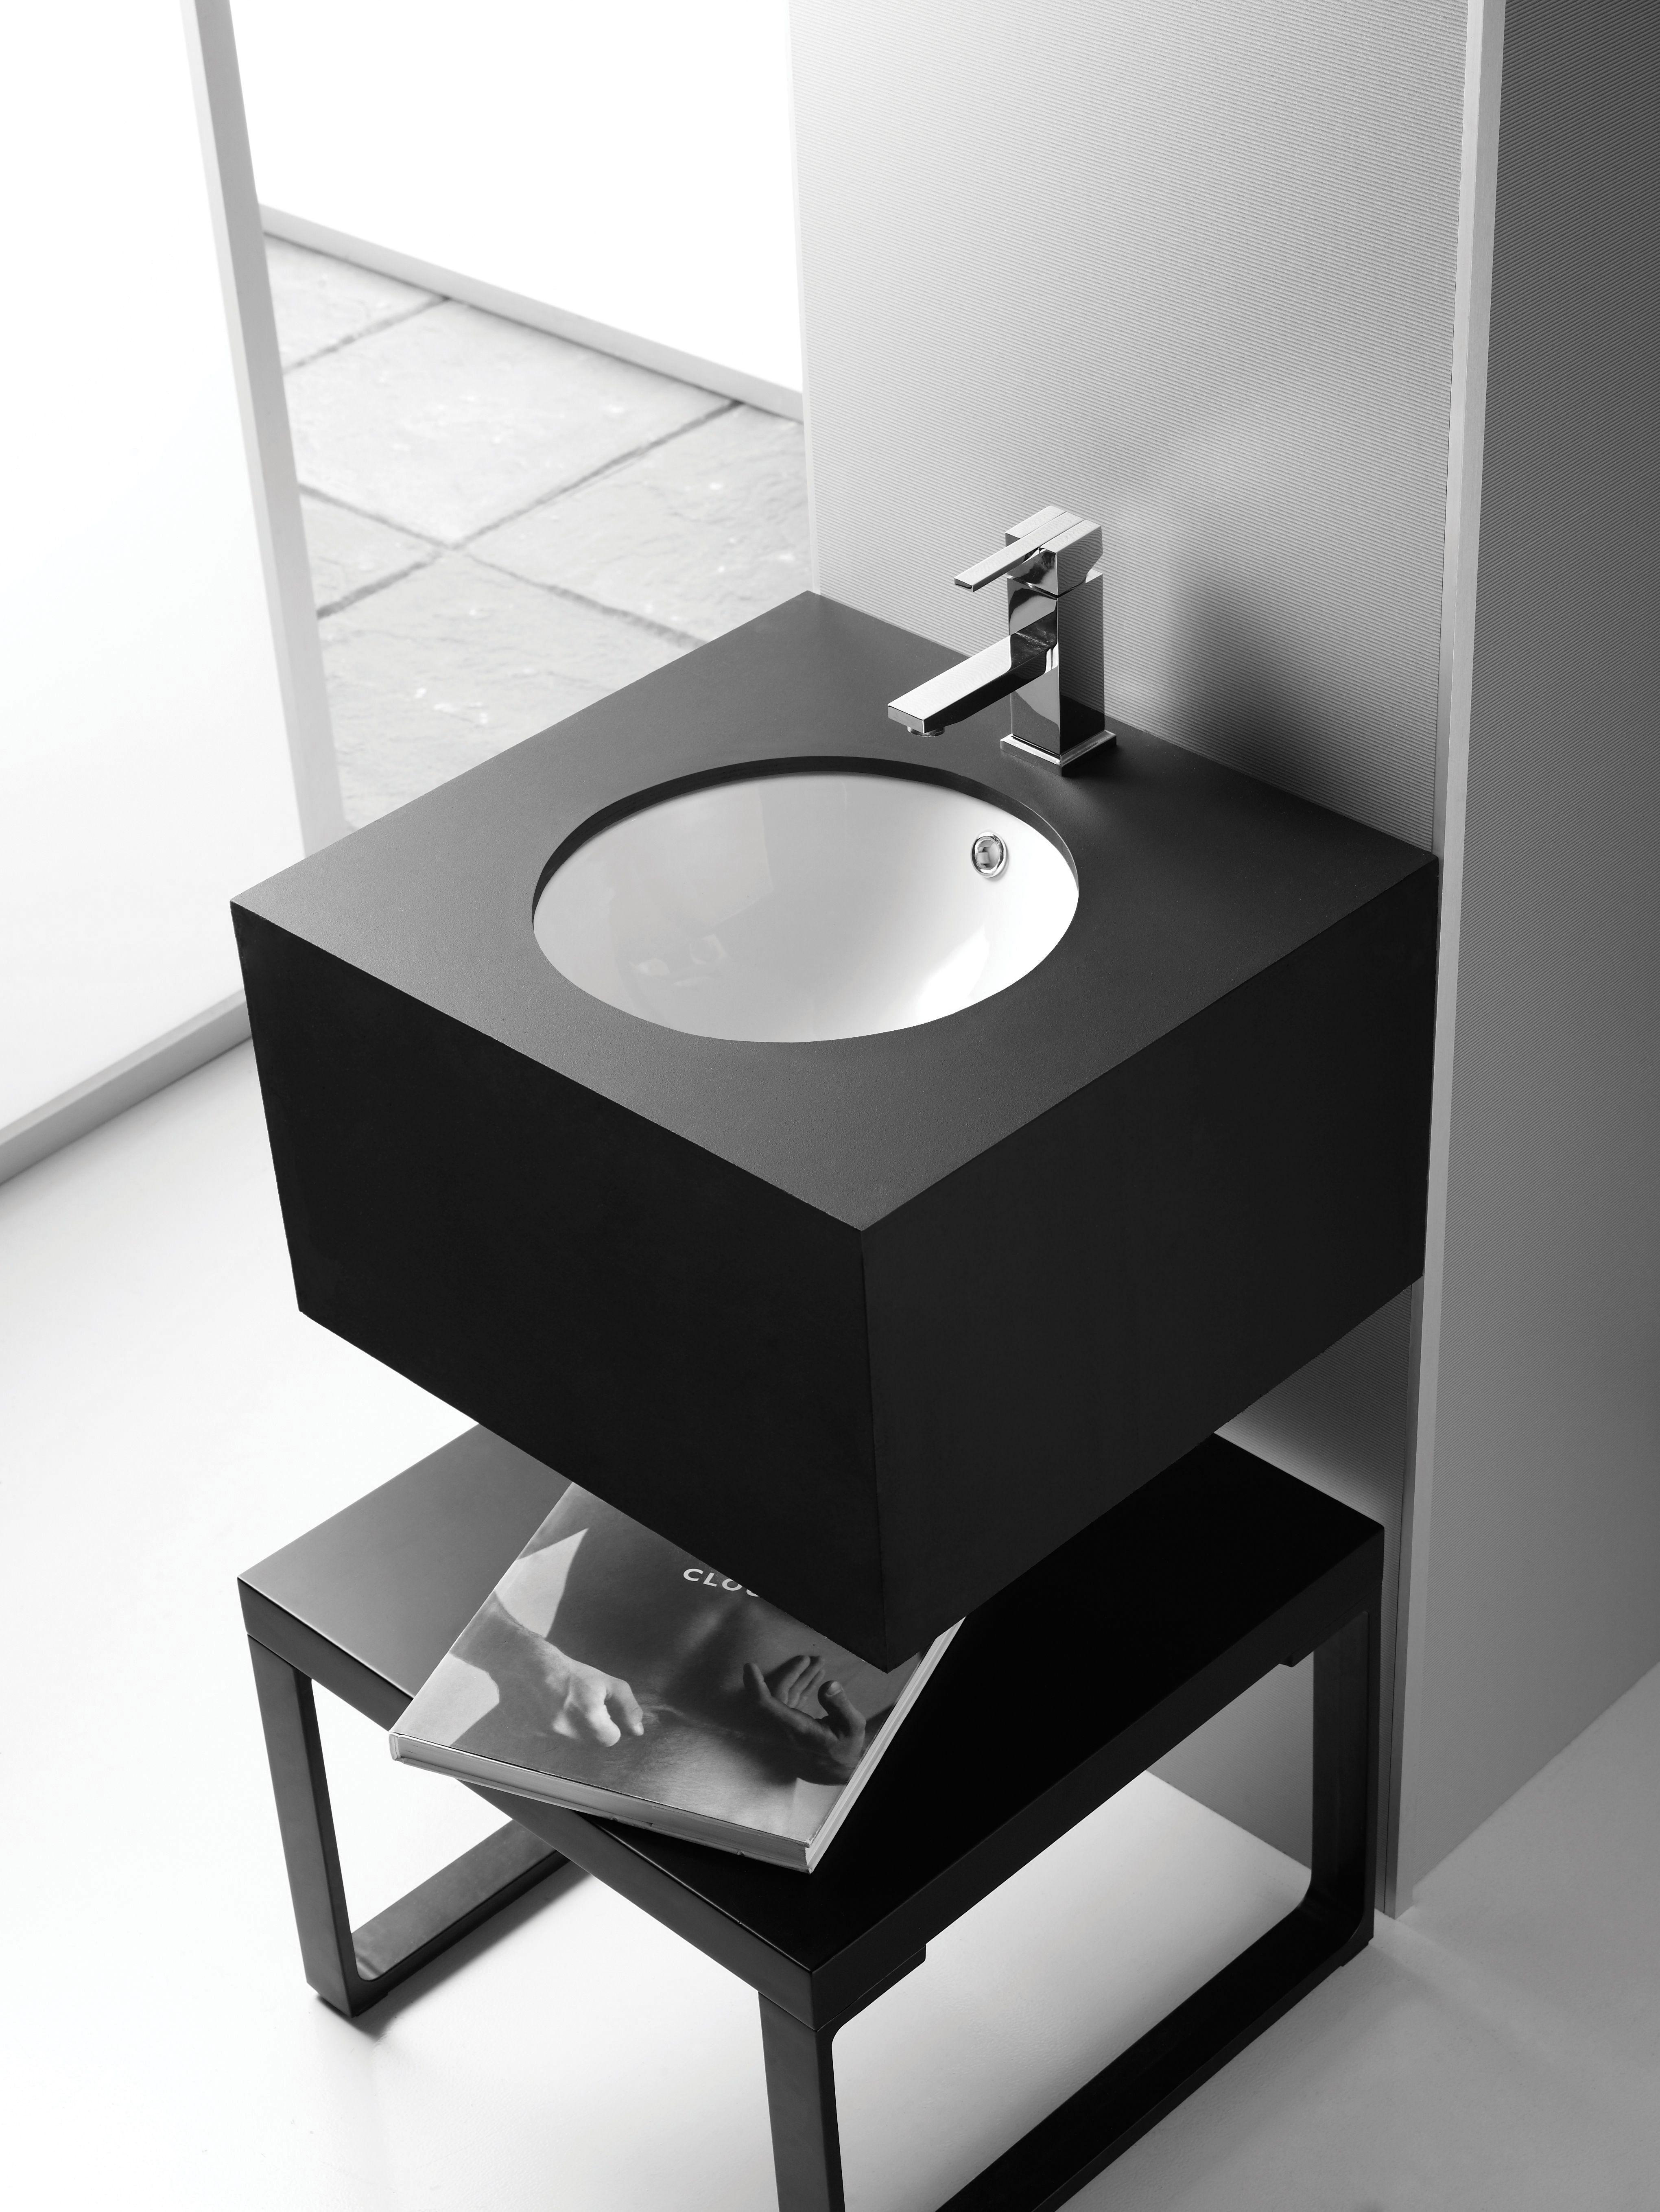 Small Bathroom Basins Undermounted Bathroom Sink Styles From Crosswater Http Www